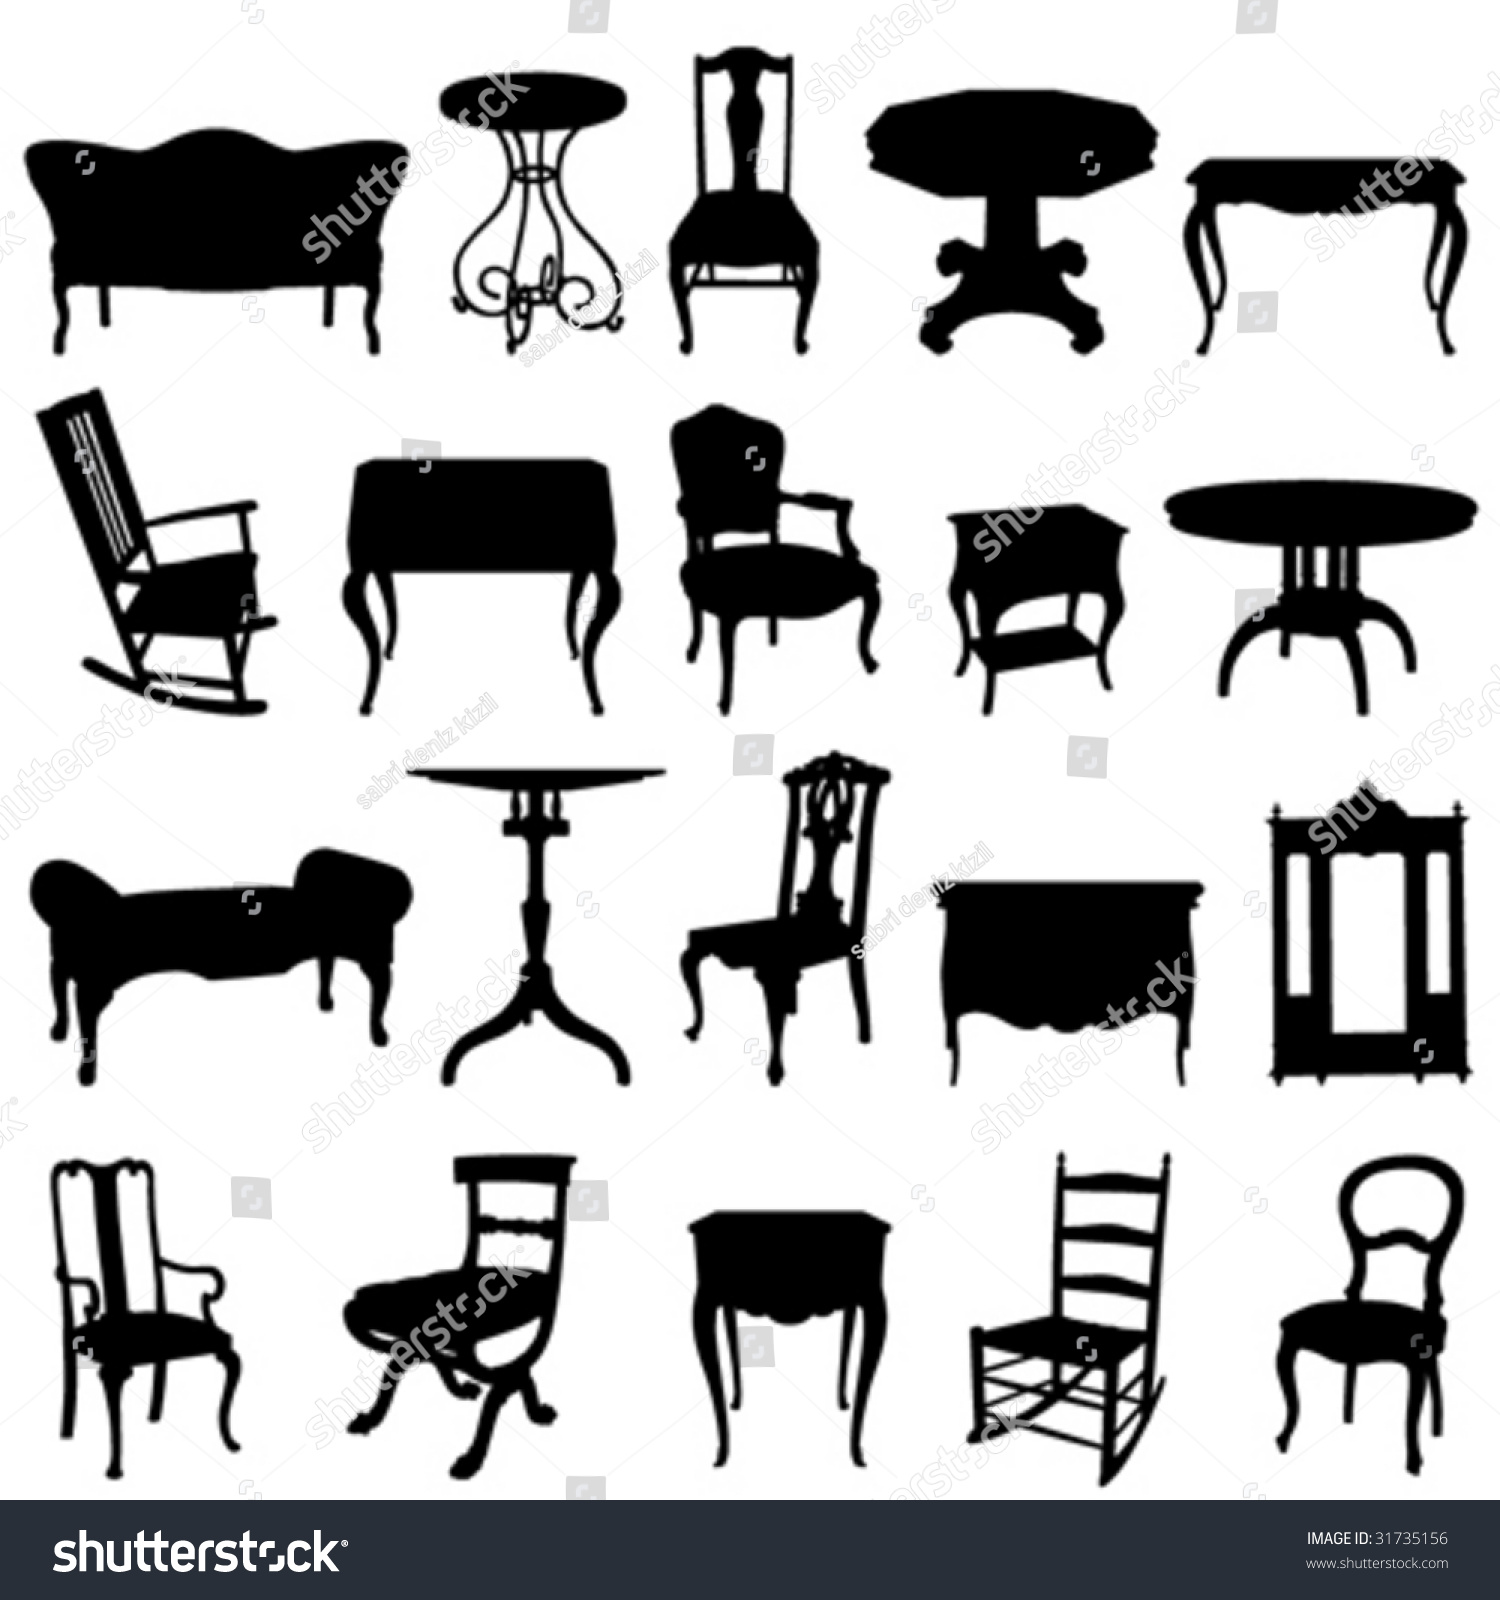 Antique chair silhouette - Antique Furnitures Set